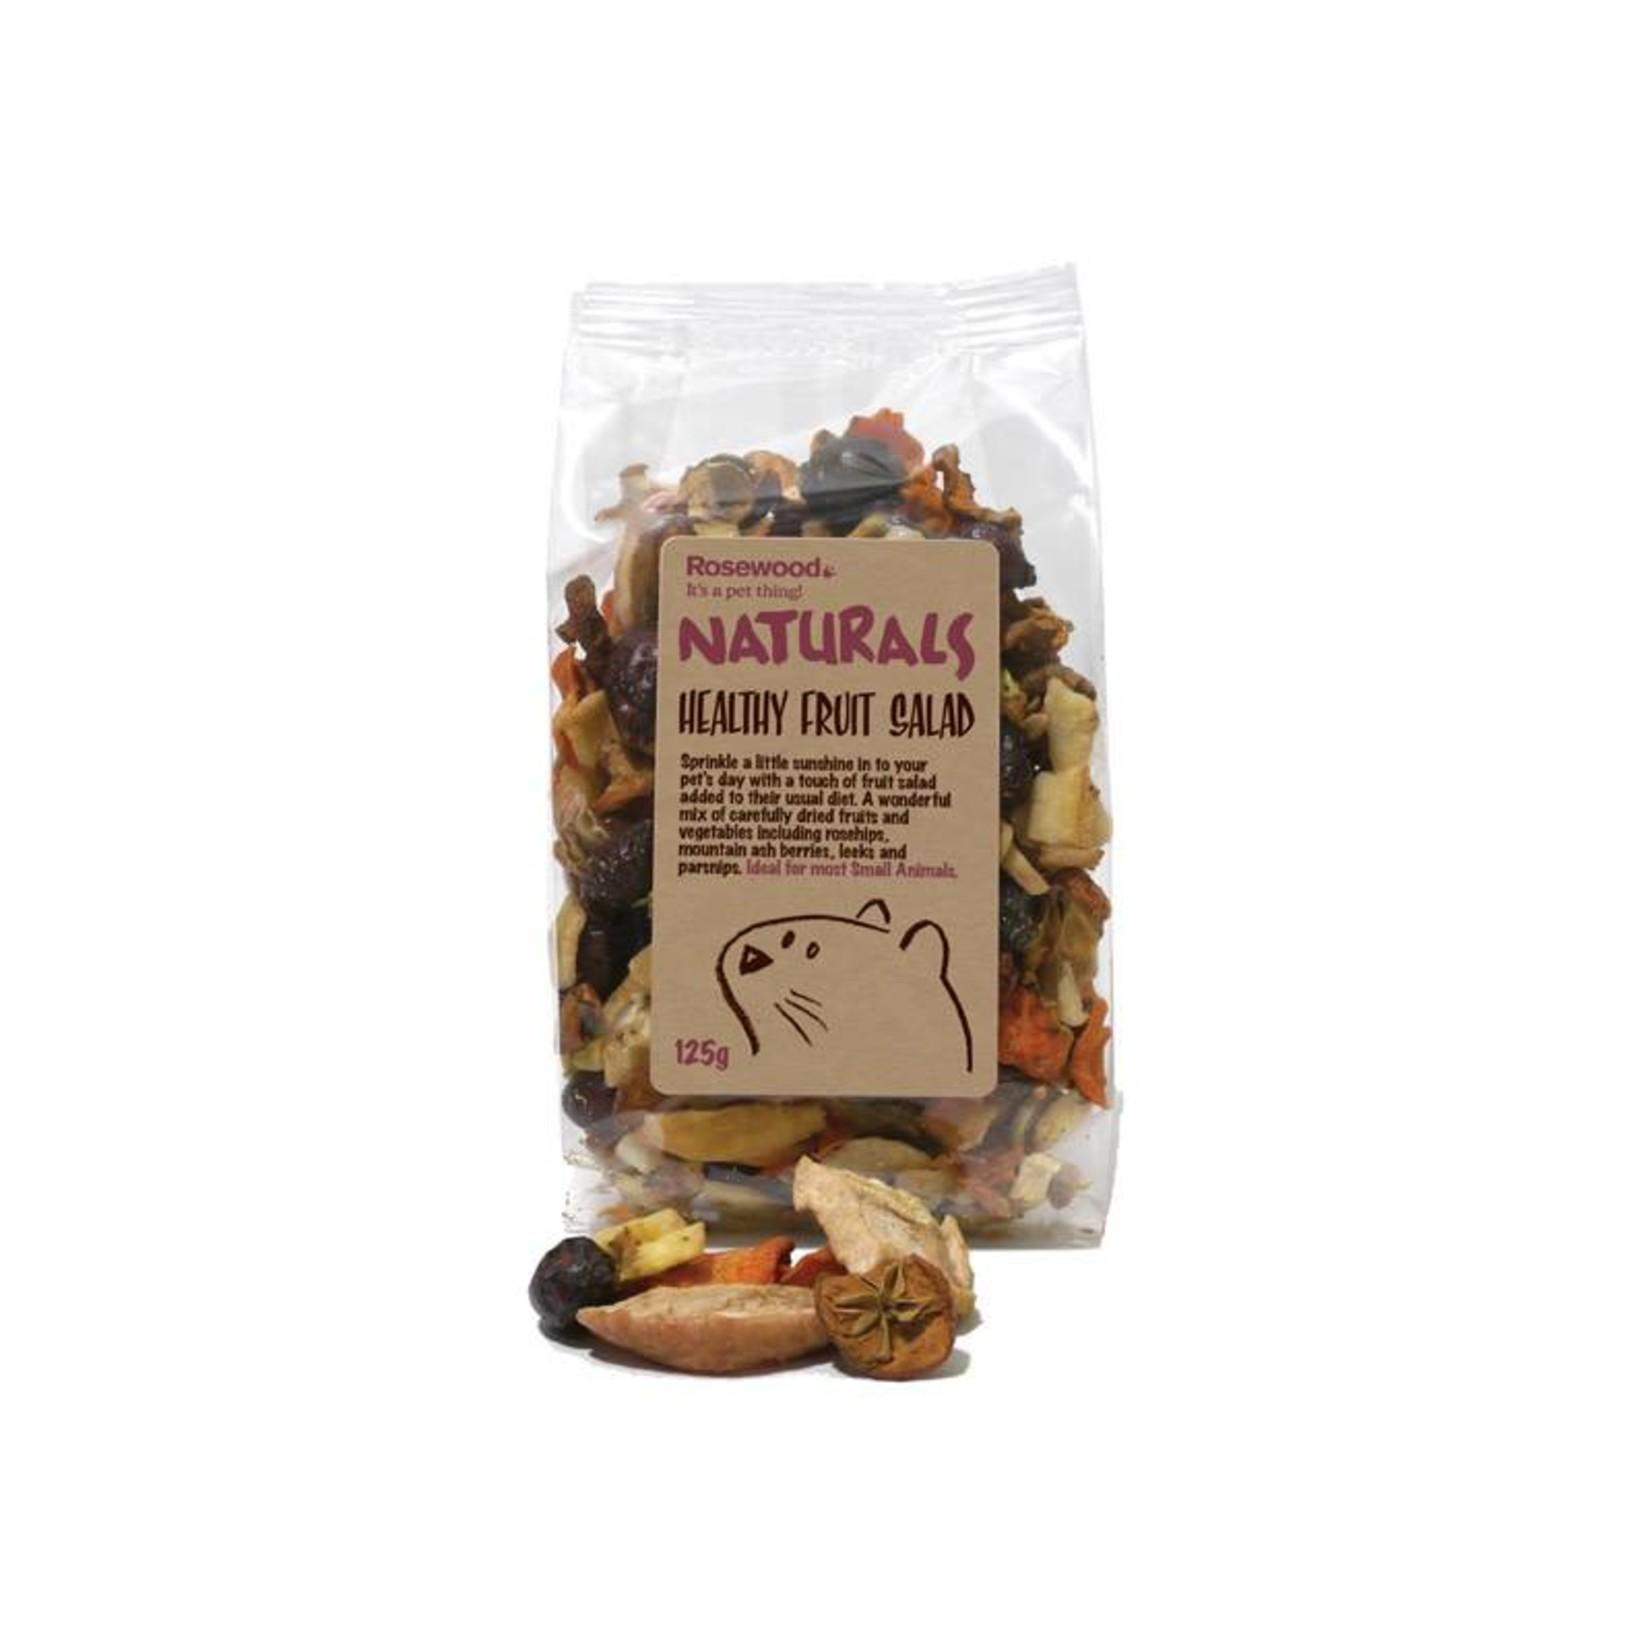 Rosewood Boredom Breaker Naturals Healthy Fruit Salad Small Animal Treats, 125g